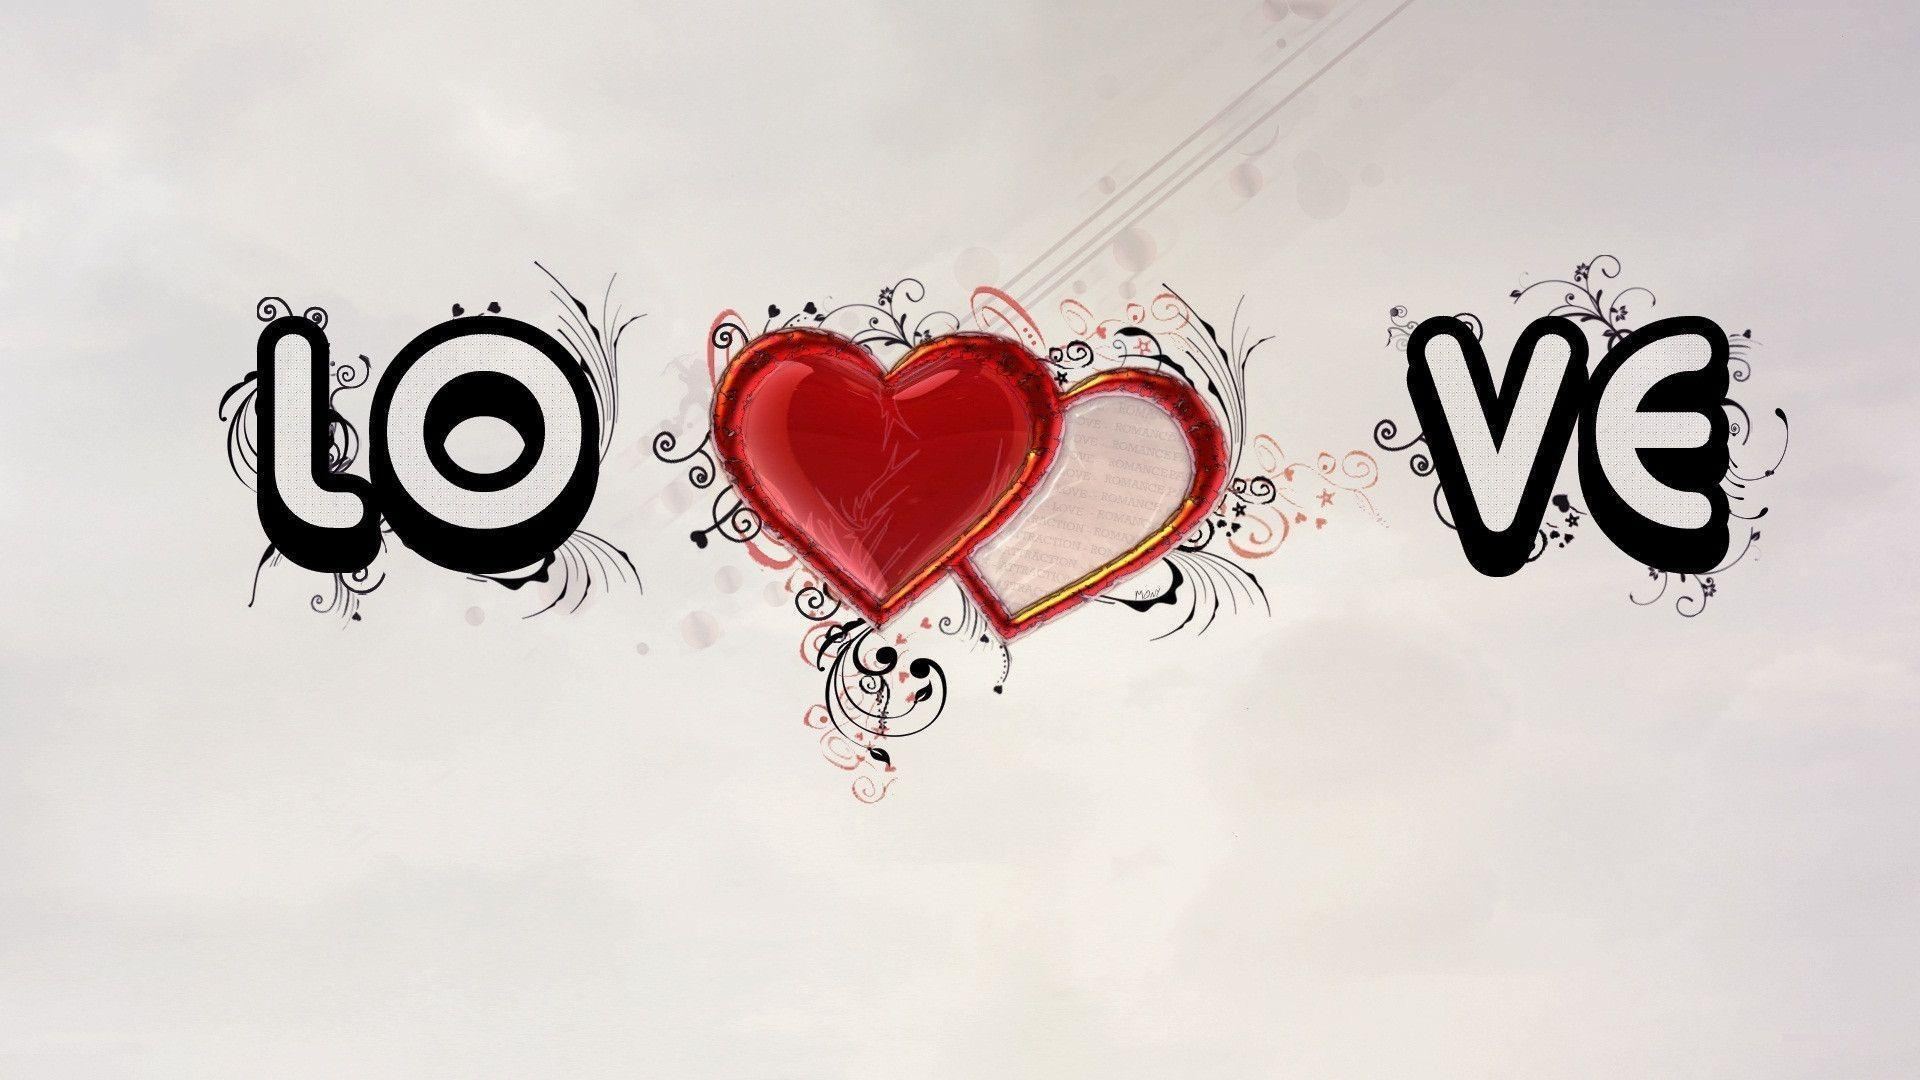 Wallpaper download dil - Love Desktop Wallpapers Free Download Love Full Hd Wallpapers